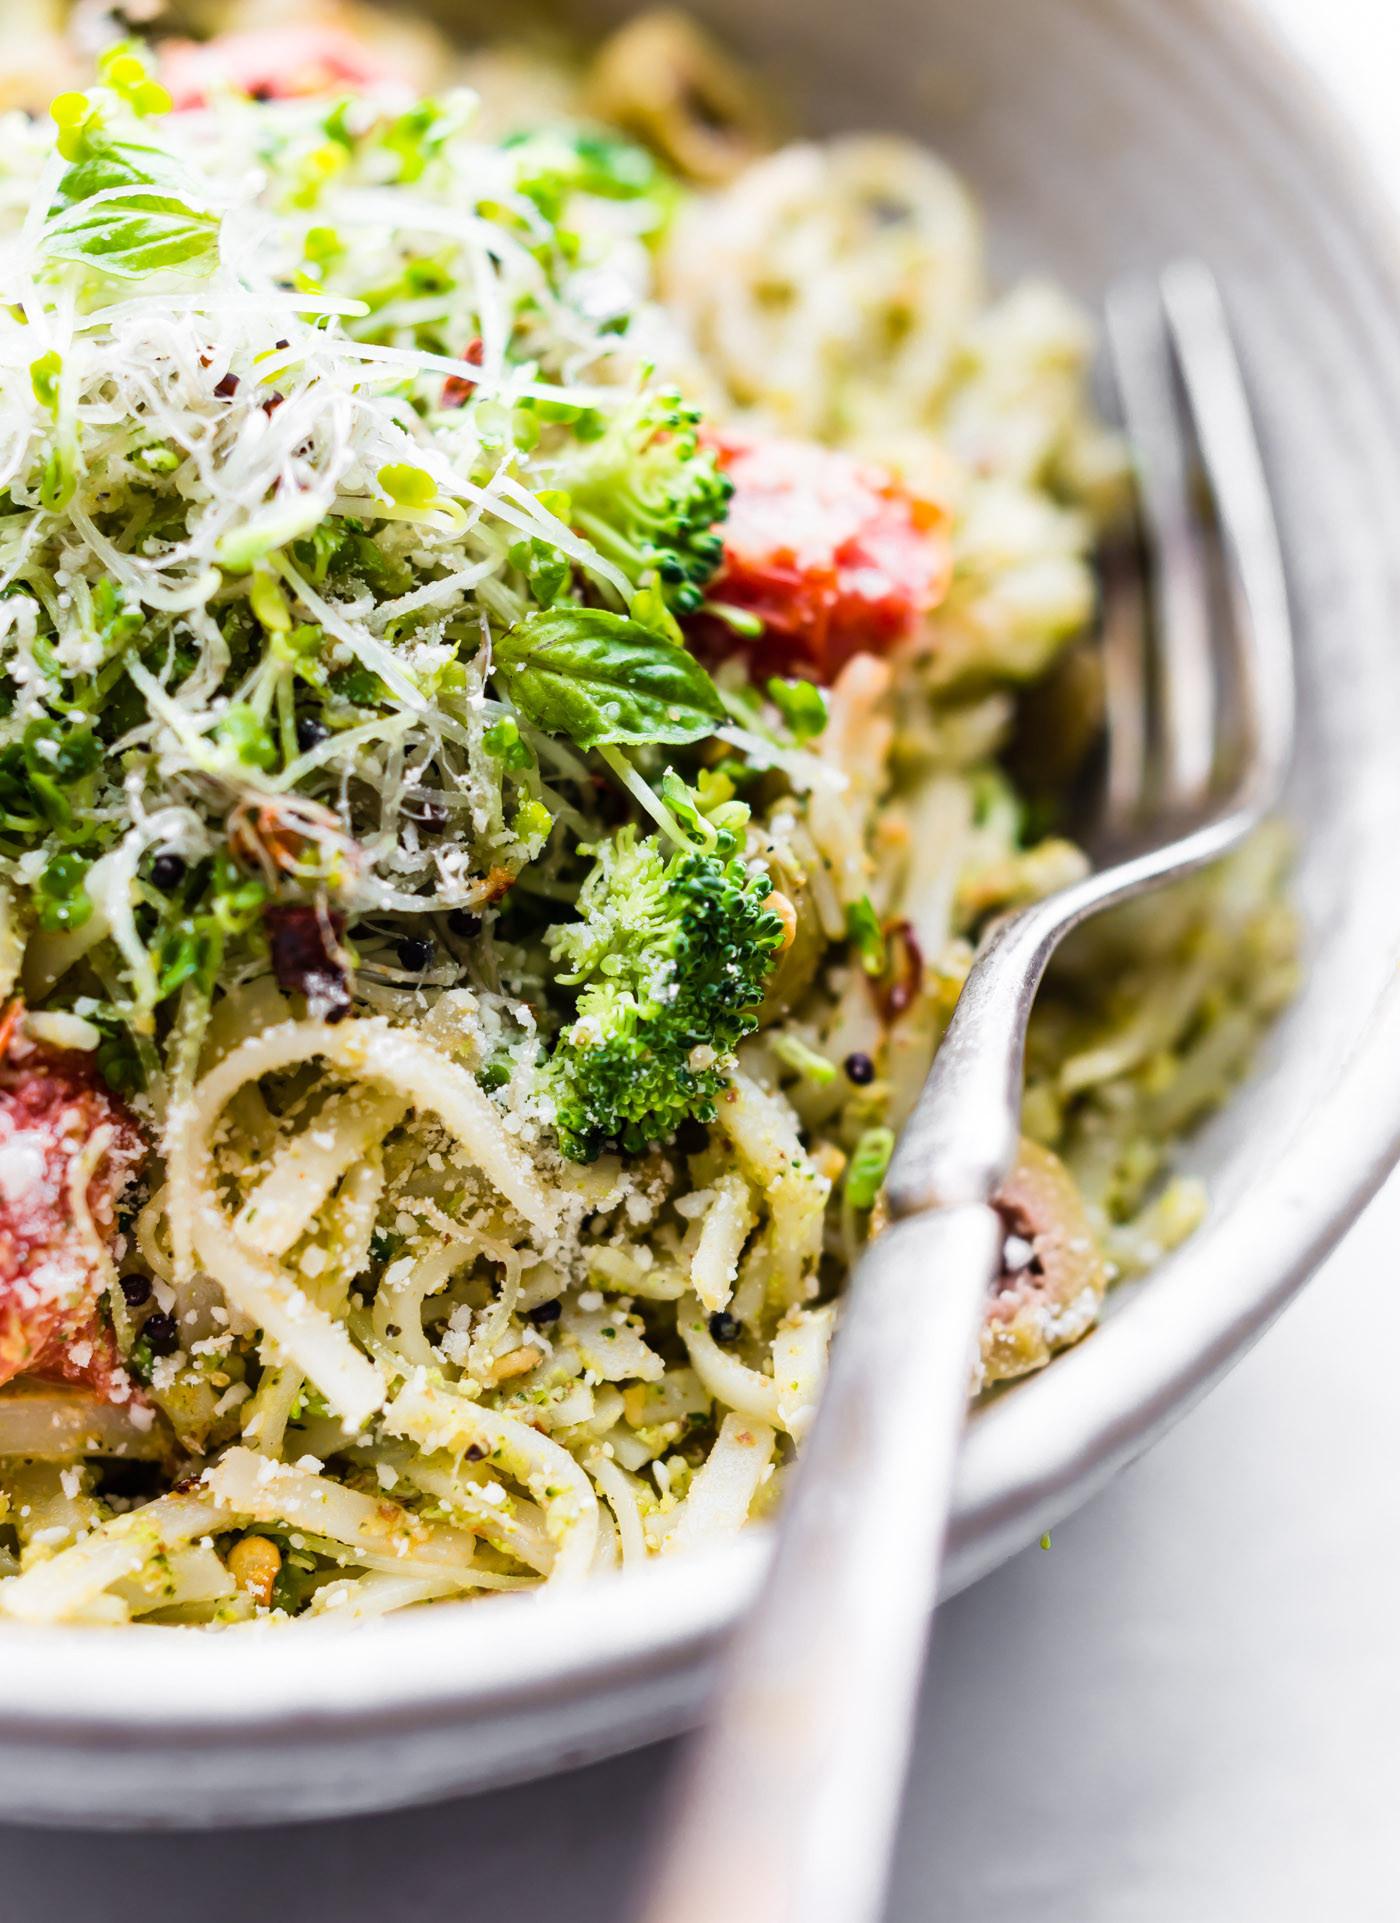 Broccoli Pesto Pasta  Quick Broccoli Arugula Pesto Pasta Vegan Option